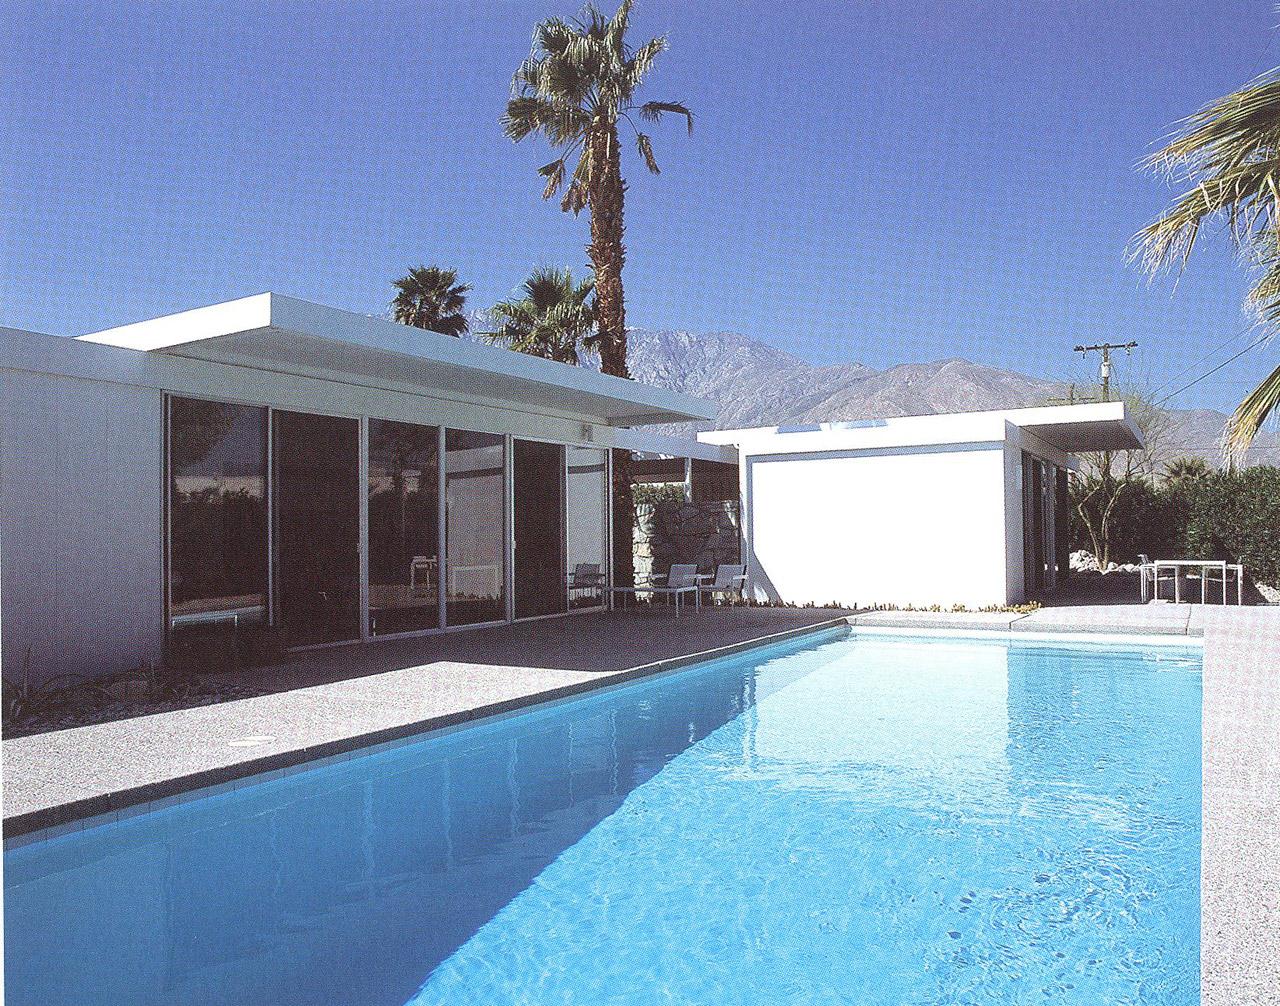 AD Classics: Steel Pre-Fab Houses / Donald Wexler, © Juergen Nogai